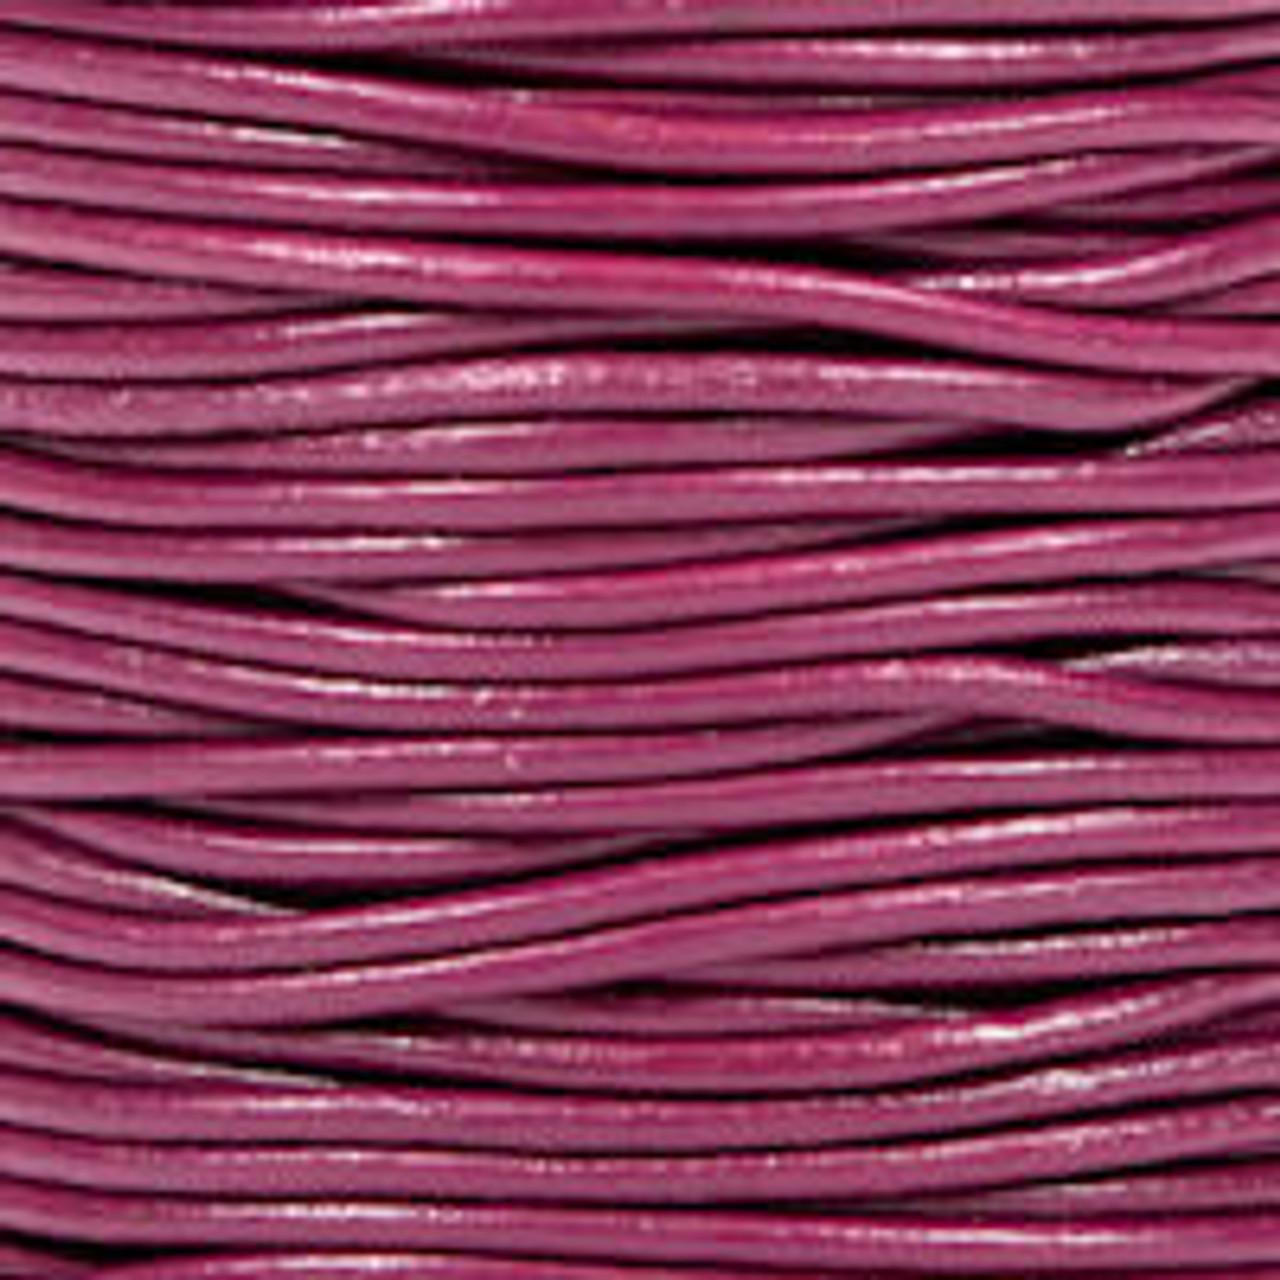 1.5mm Cyclamen Leather (2 Meters)